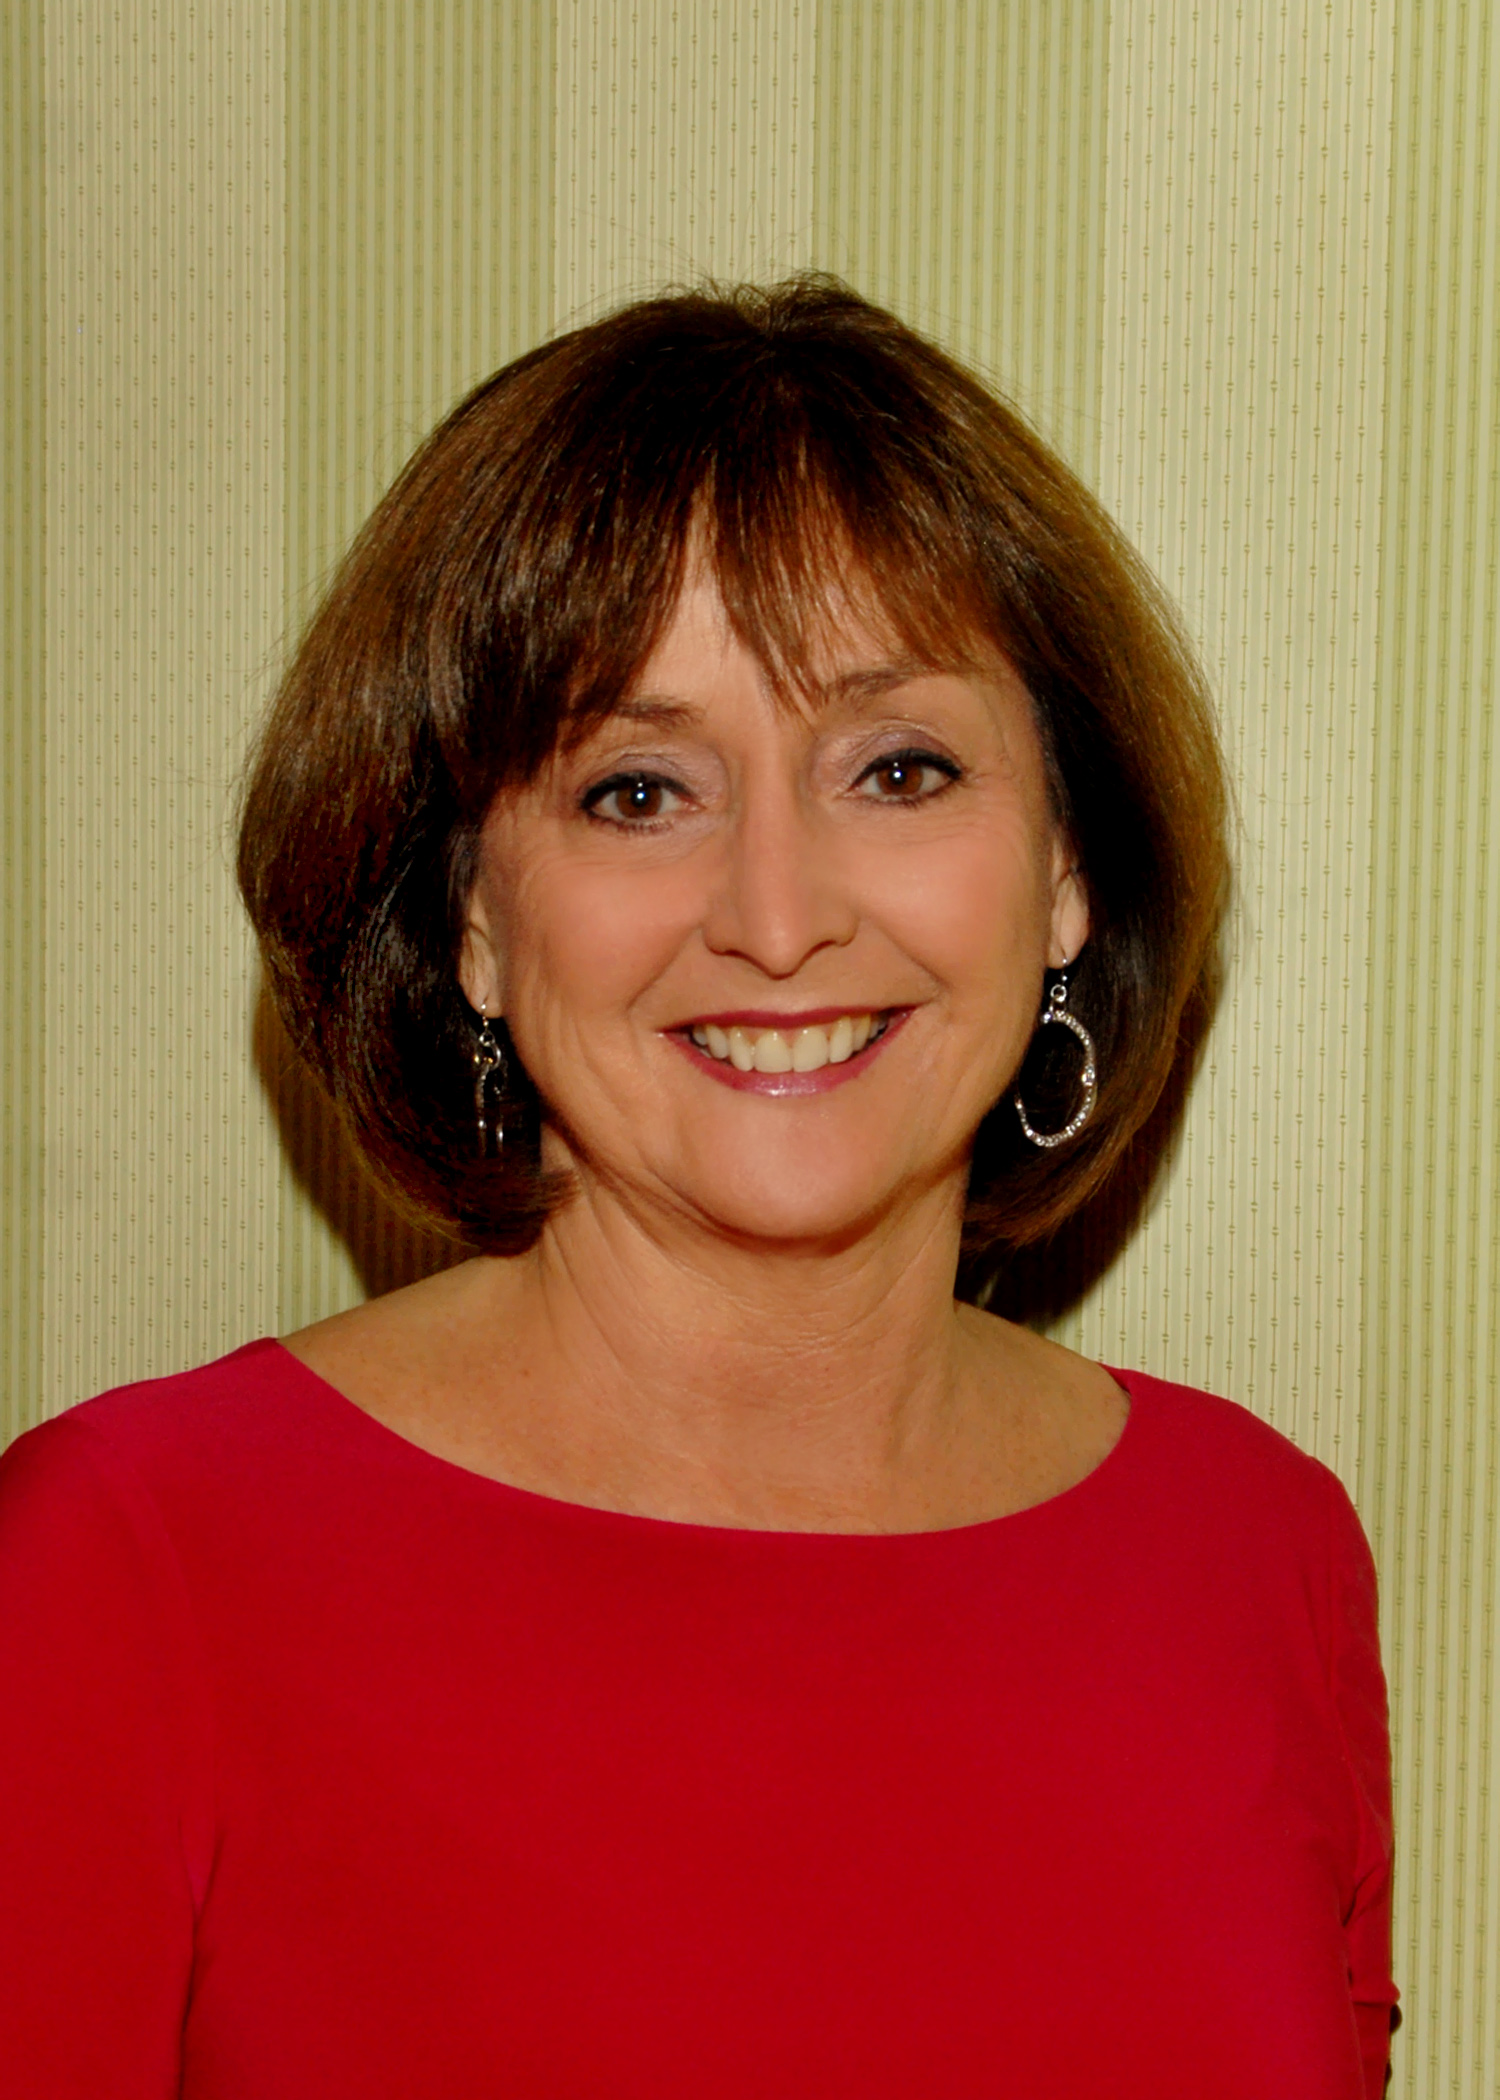 Kathy Carver